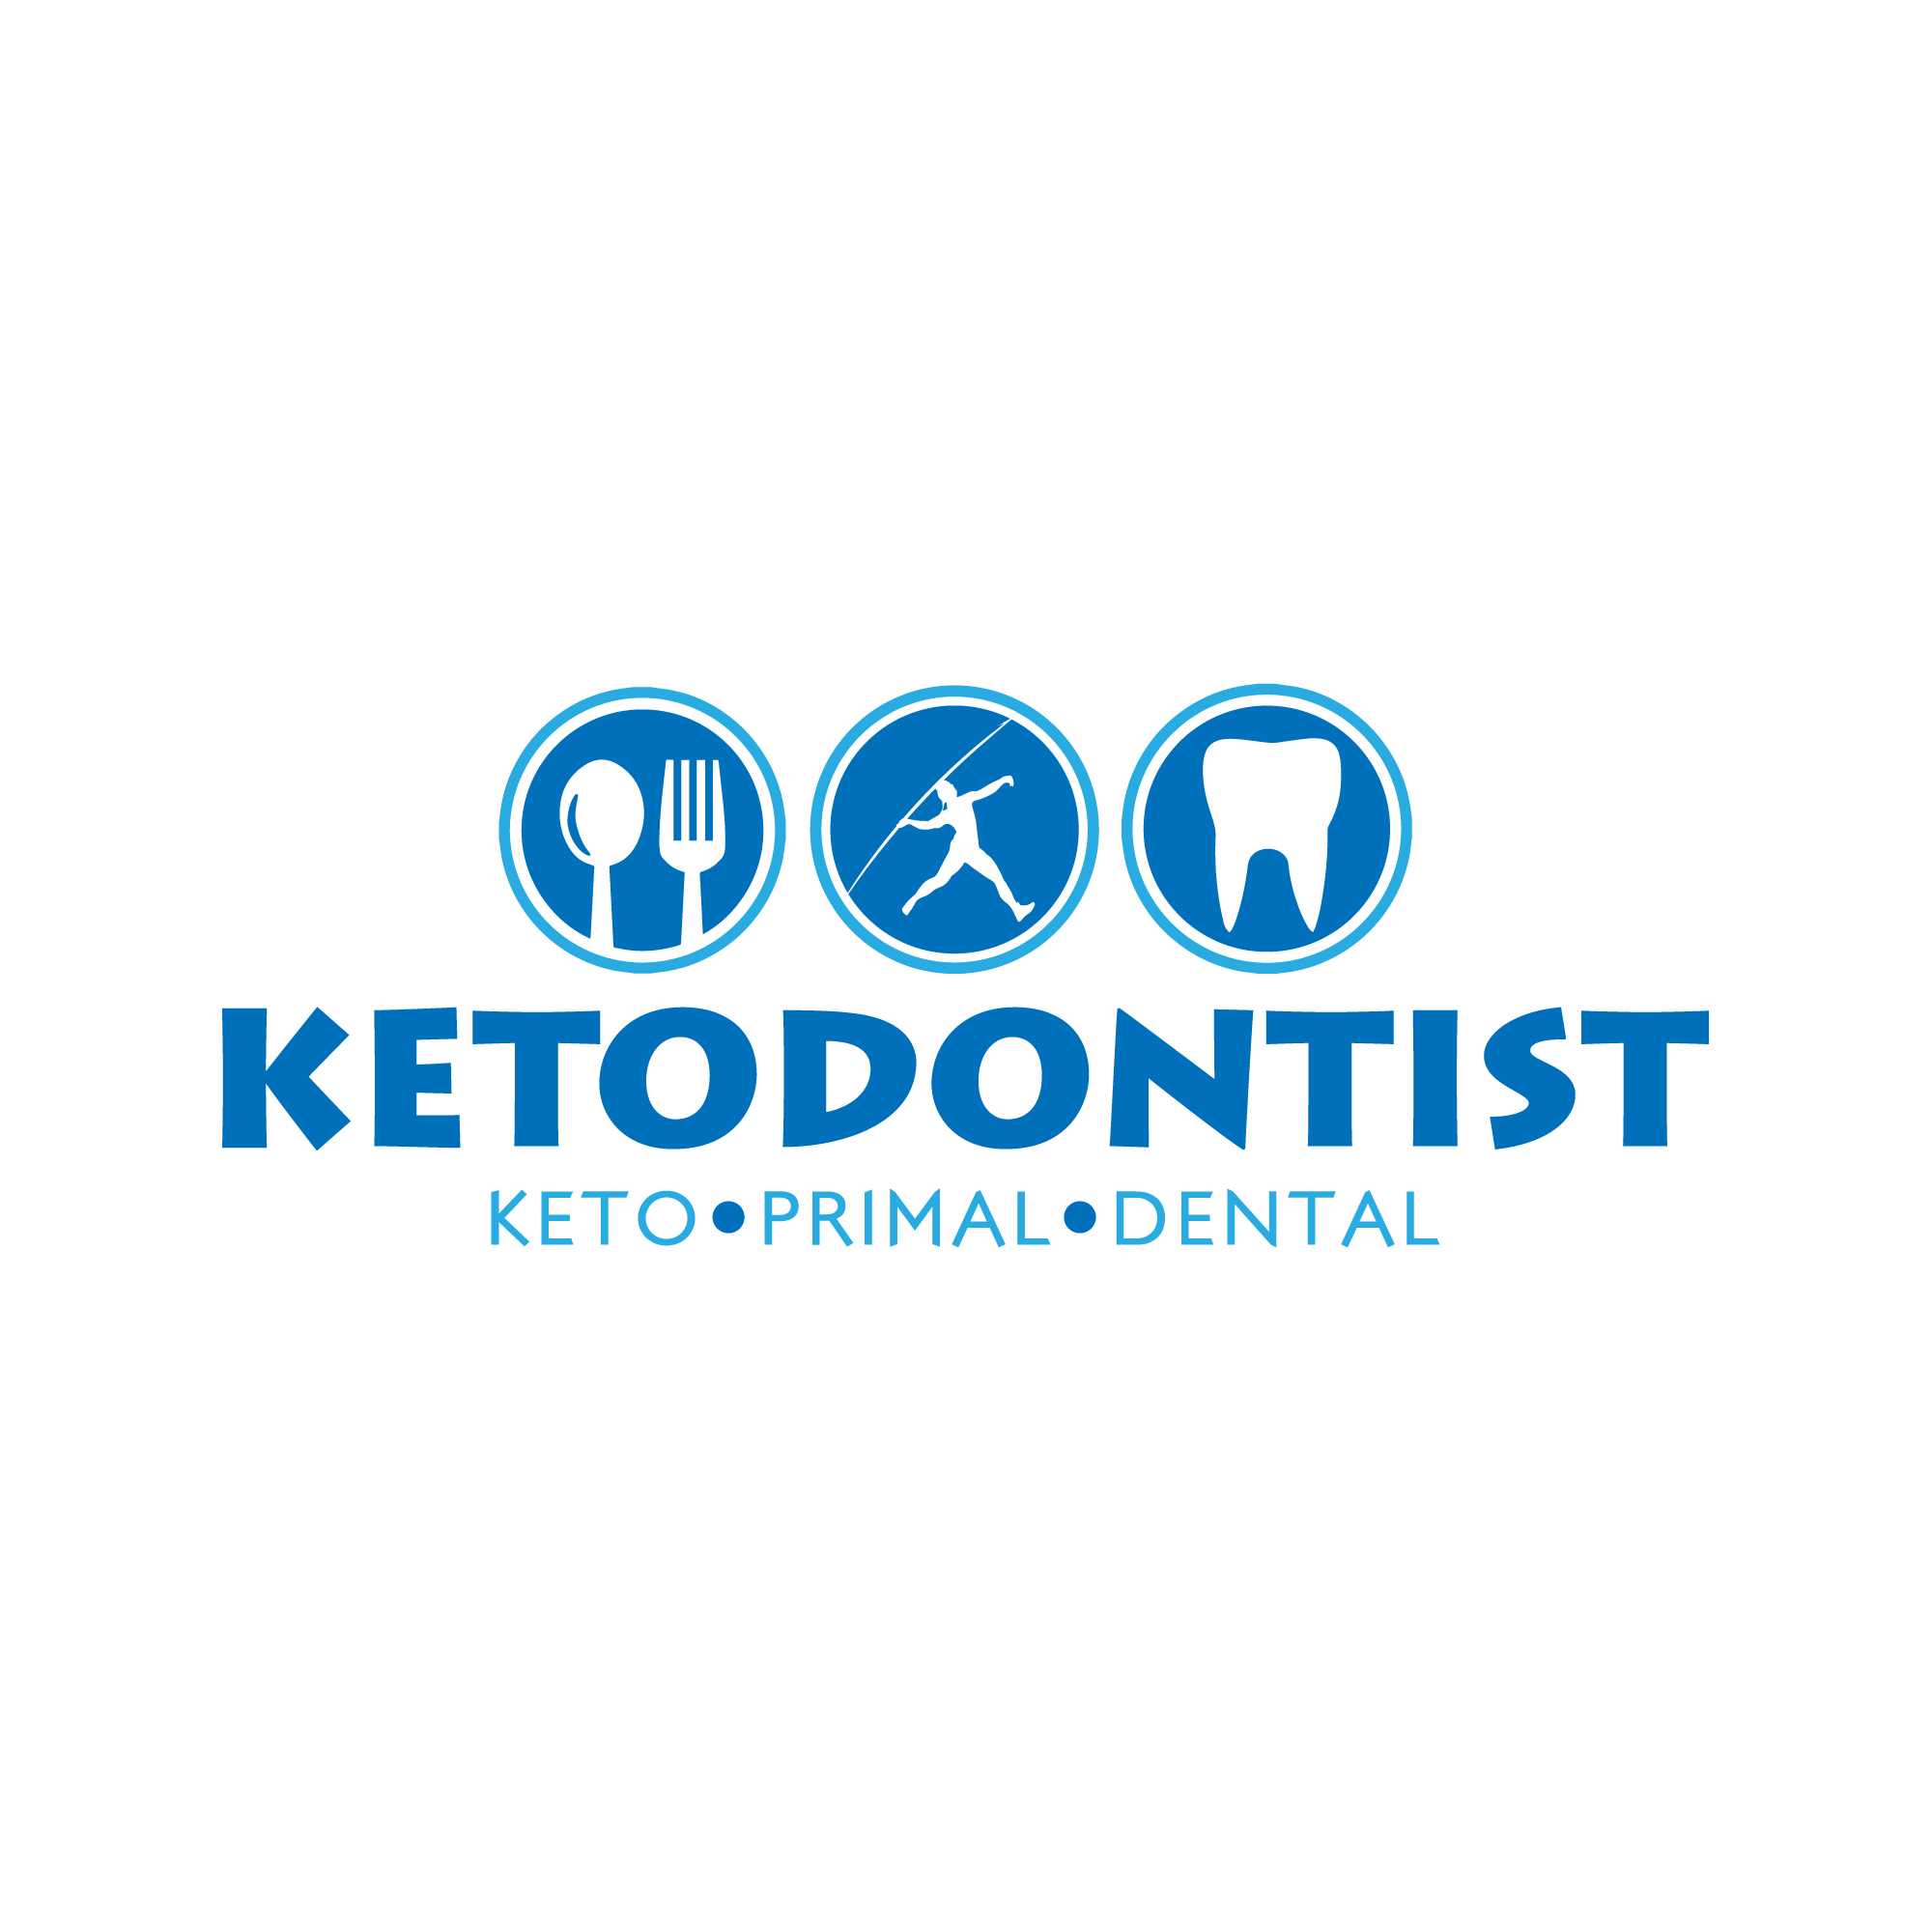 Ketodontist Podcast show art